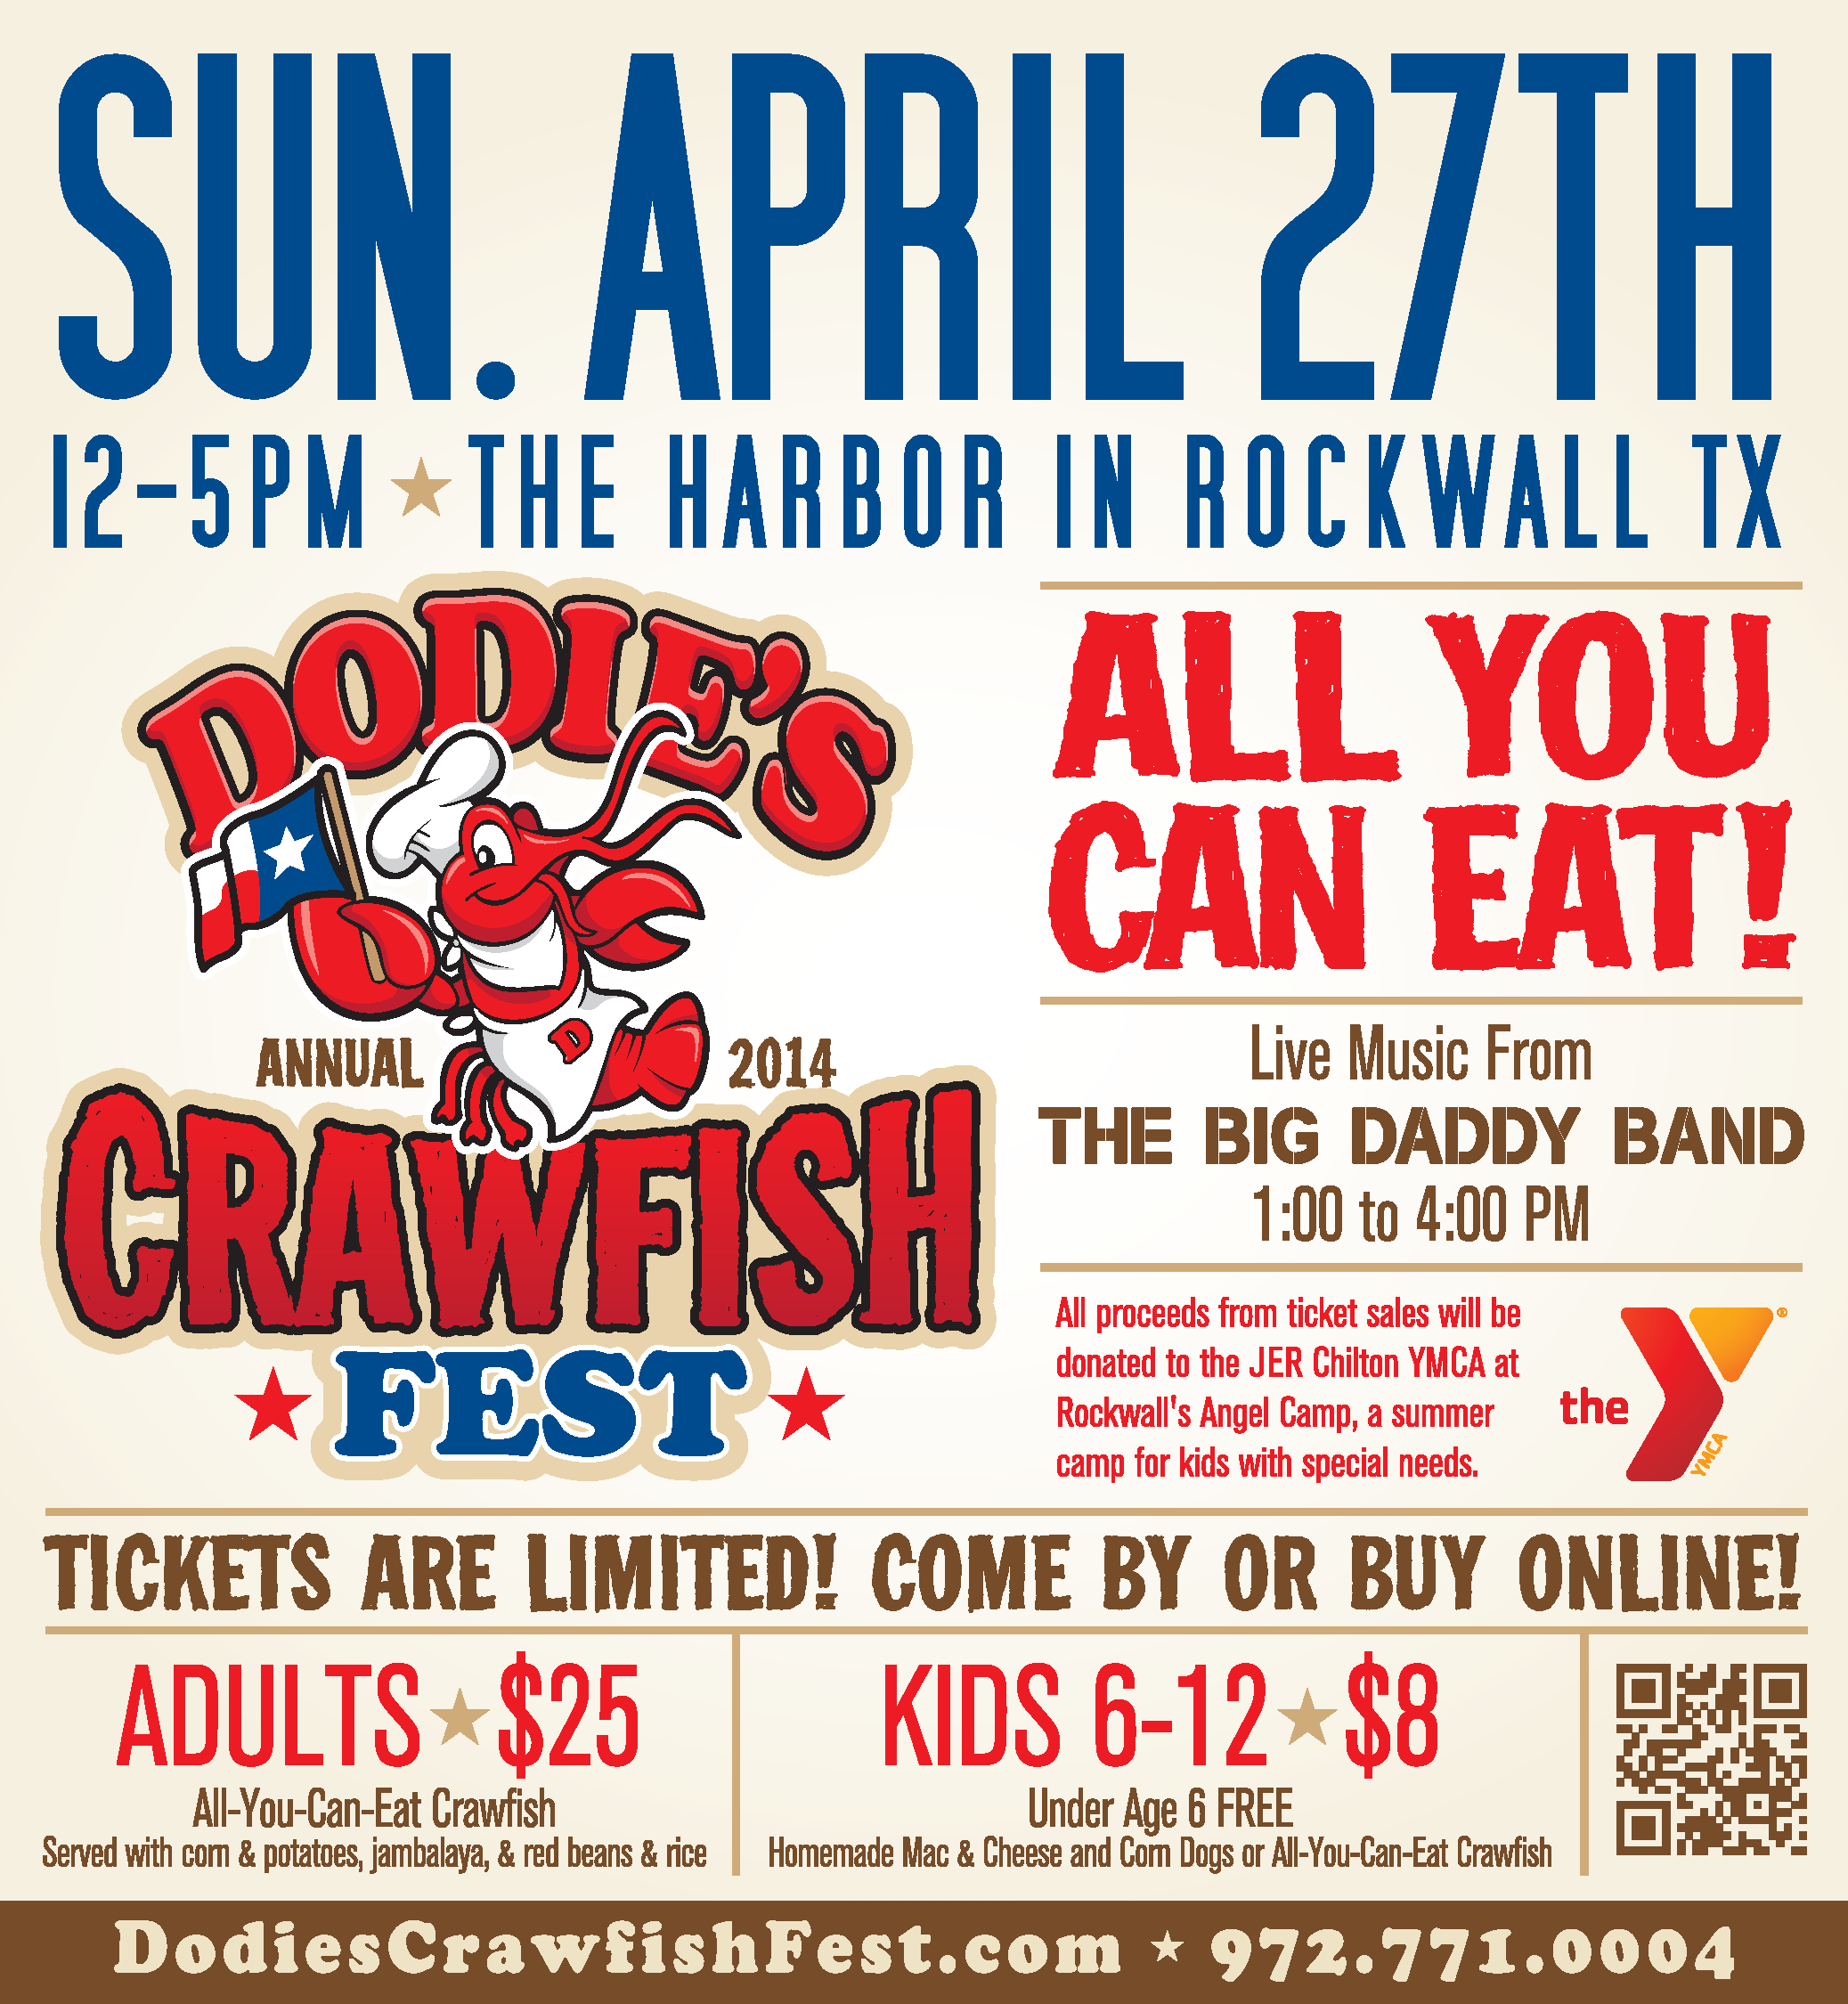 2013 Dodies Annual Crawfish Fest Brn Print Full Page 10_375 X11_25 Crawfish  Fest Dodie's Cajun Diner